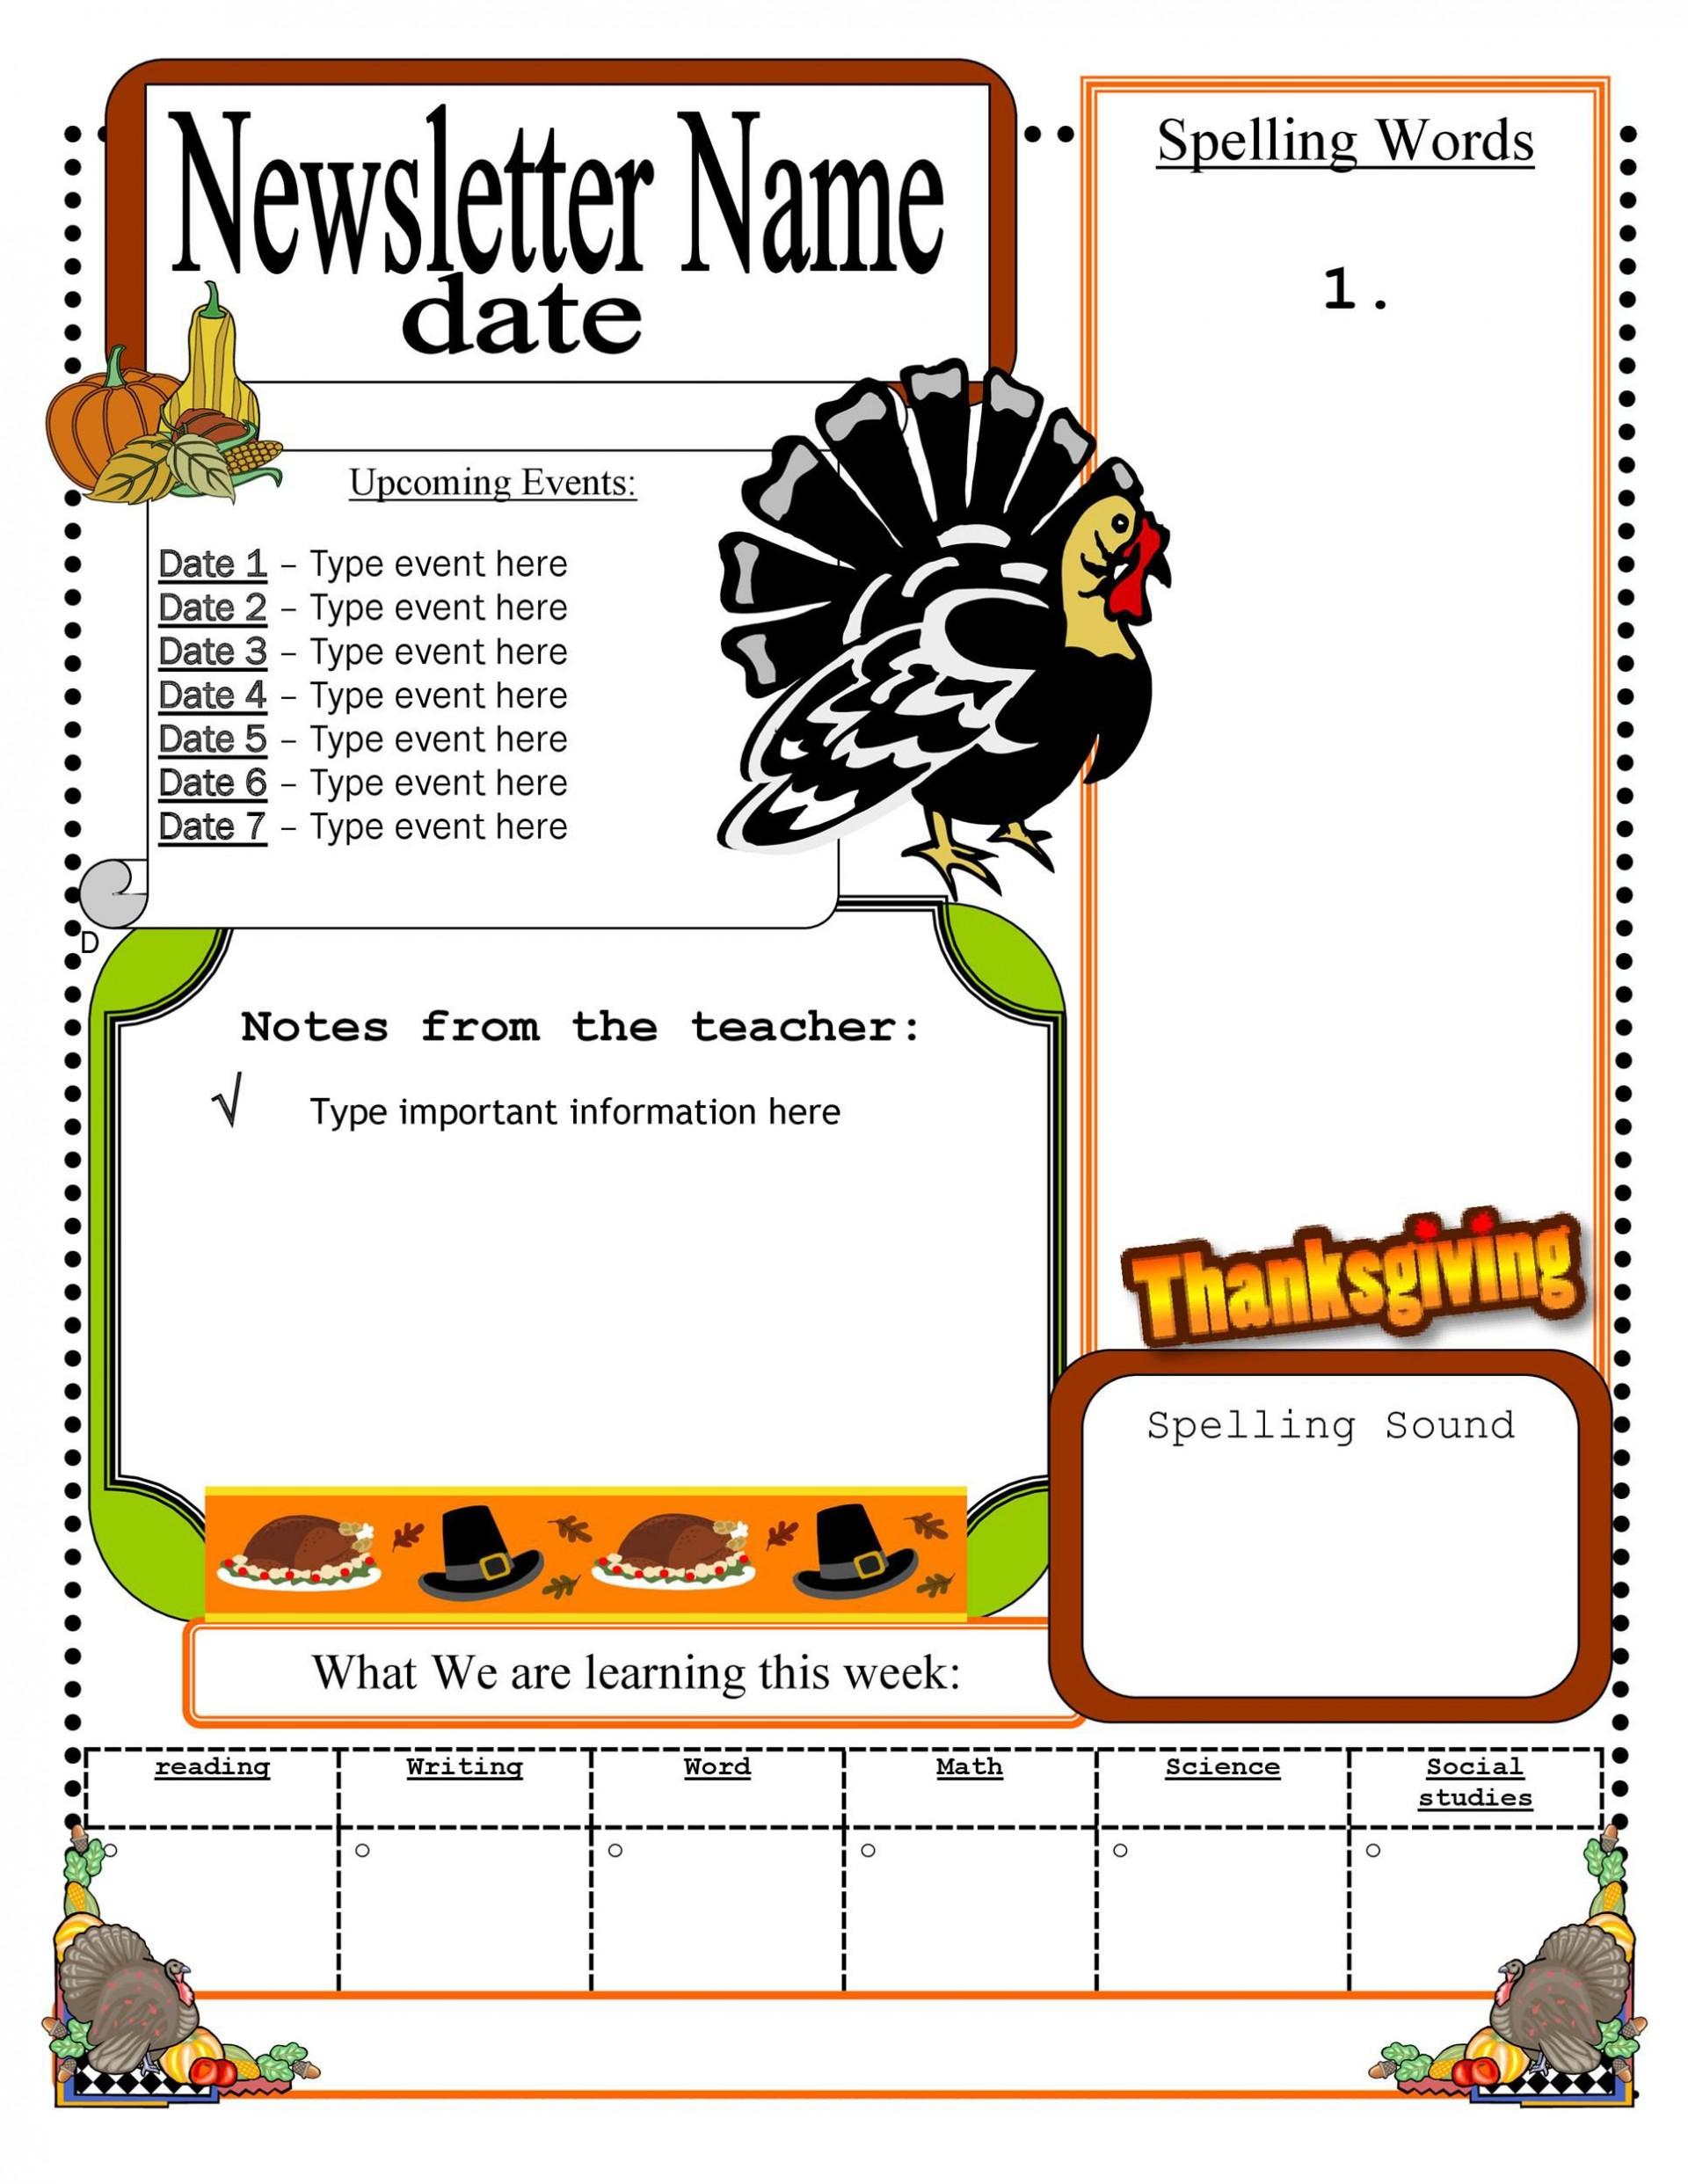 006 Sensational Newsletter Template For Teacher High Resolution  Teachers To Parent Printable Free School1920